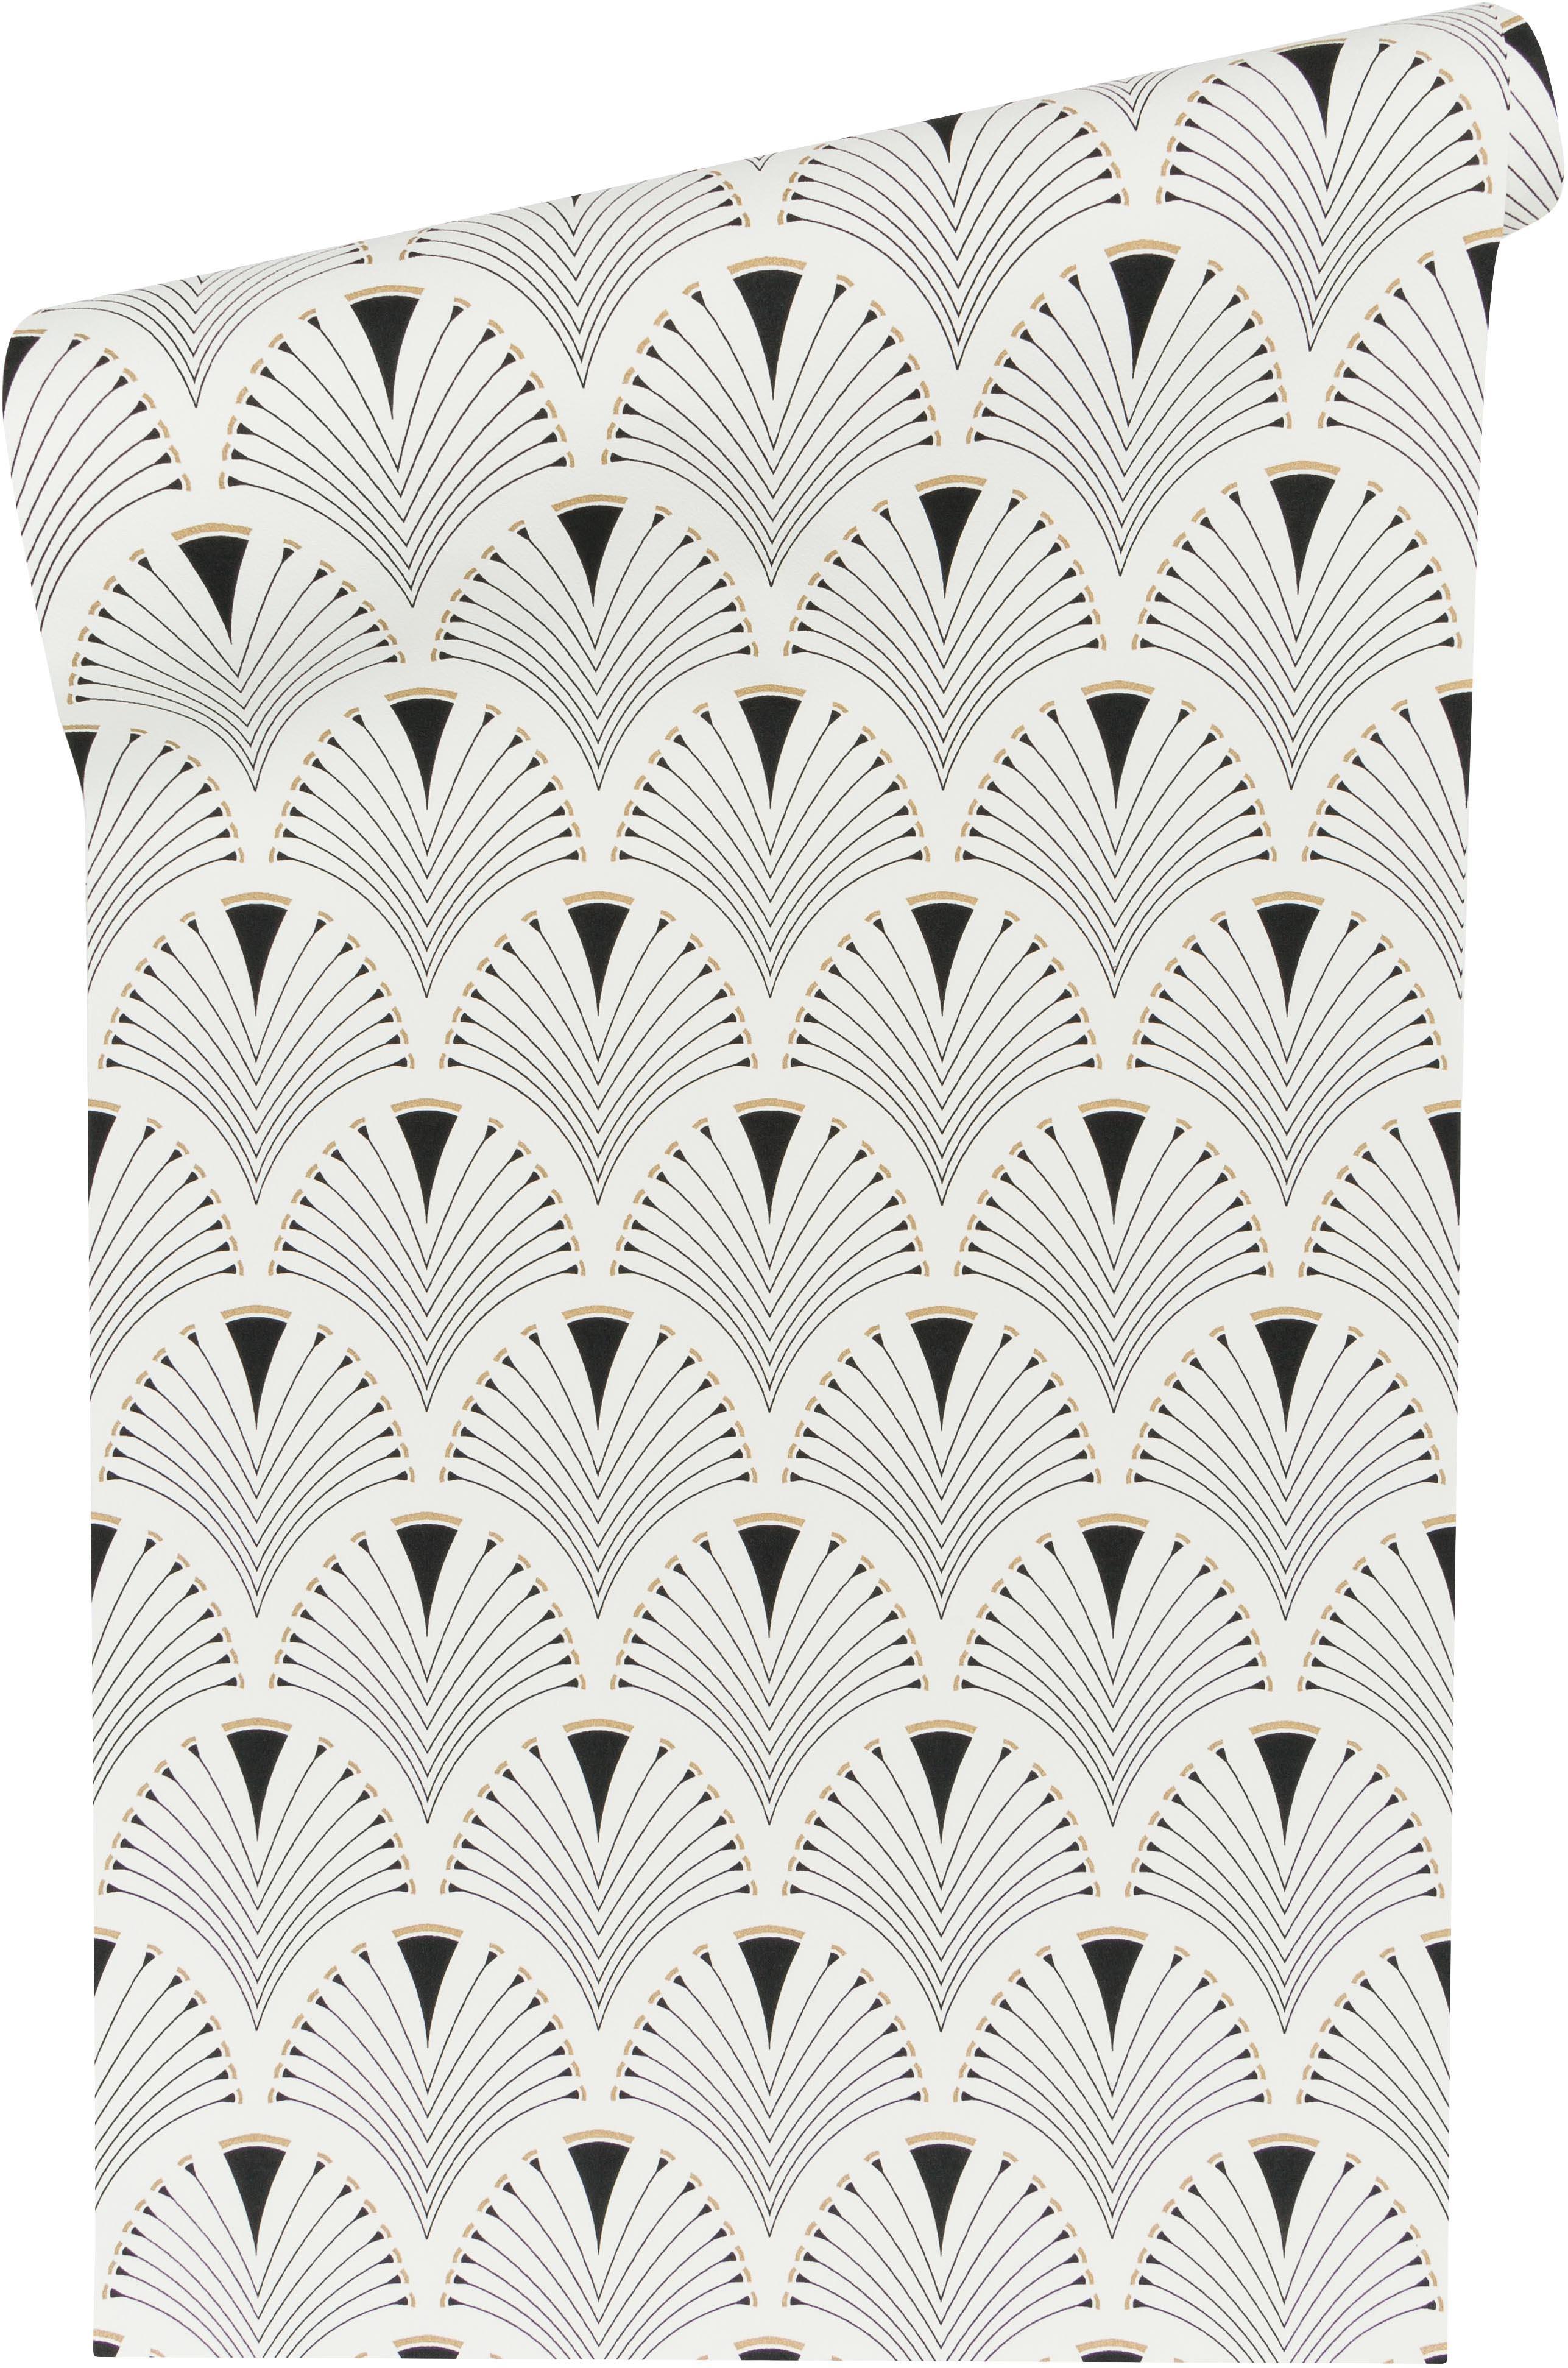 Papel pintado Peacock, Tejido no tejido, Blanco, negro, dorado, brillante, An 53 x L 1005 cm